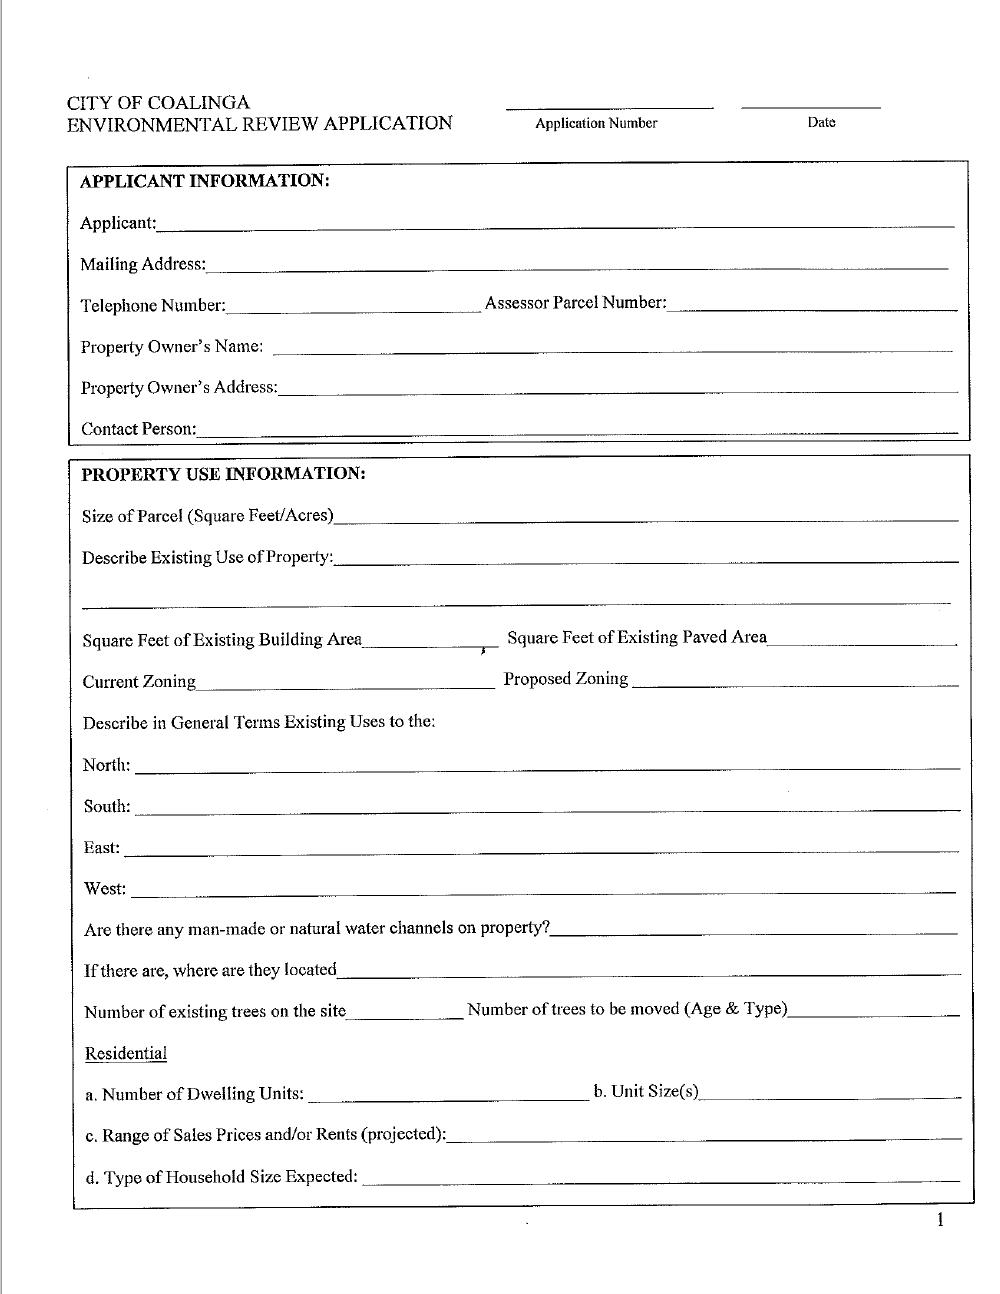 Environmental Review Application.png